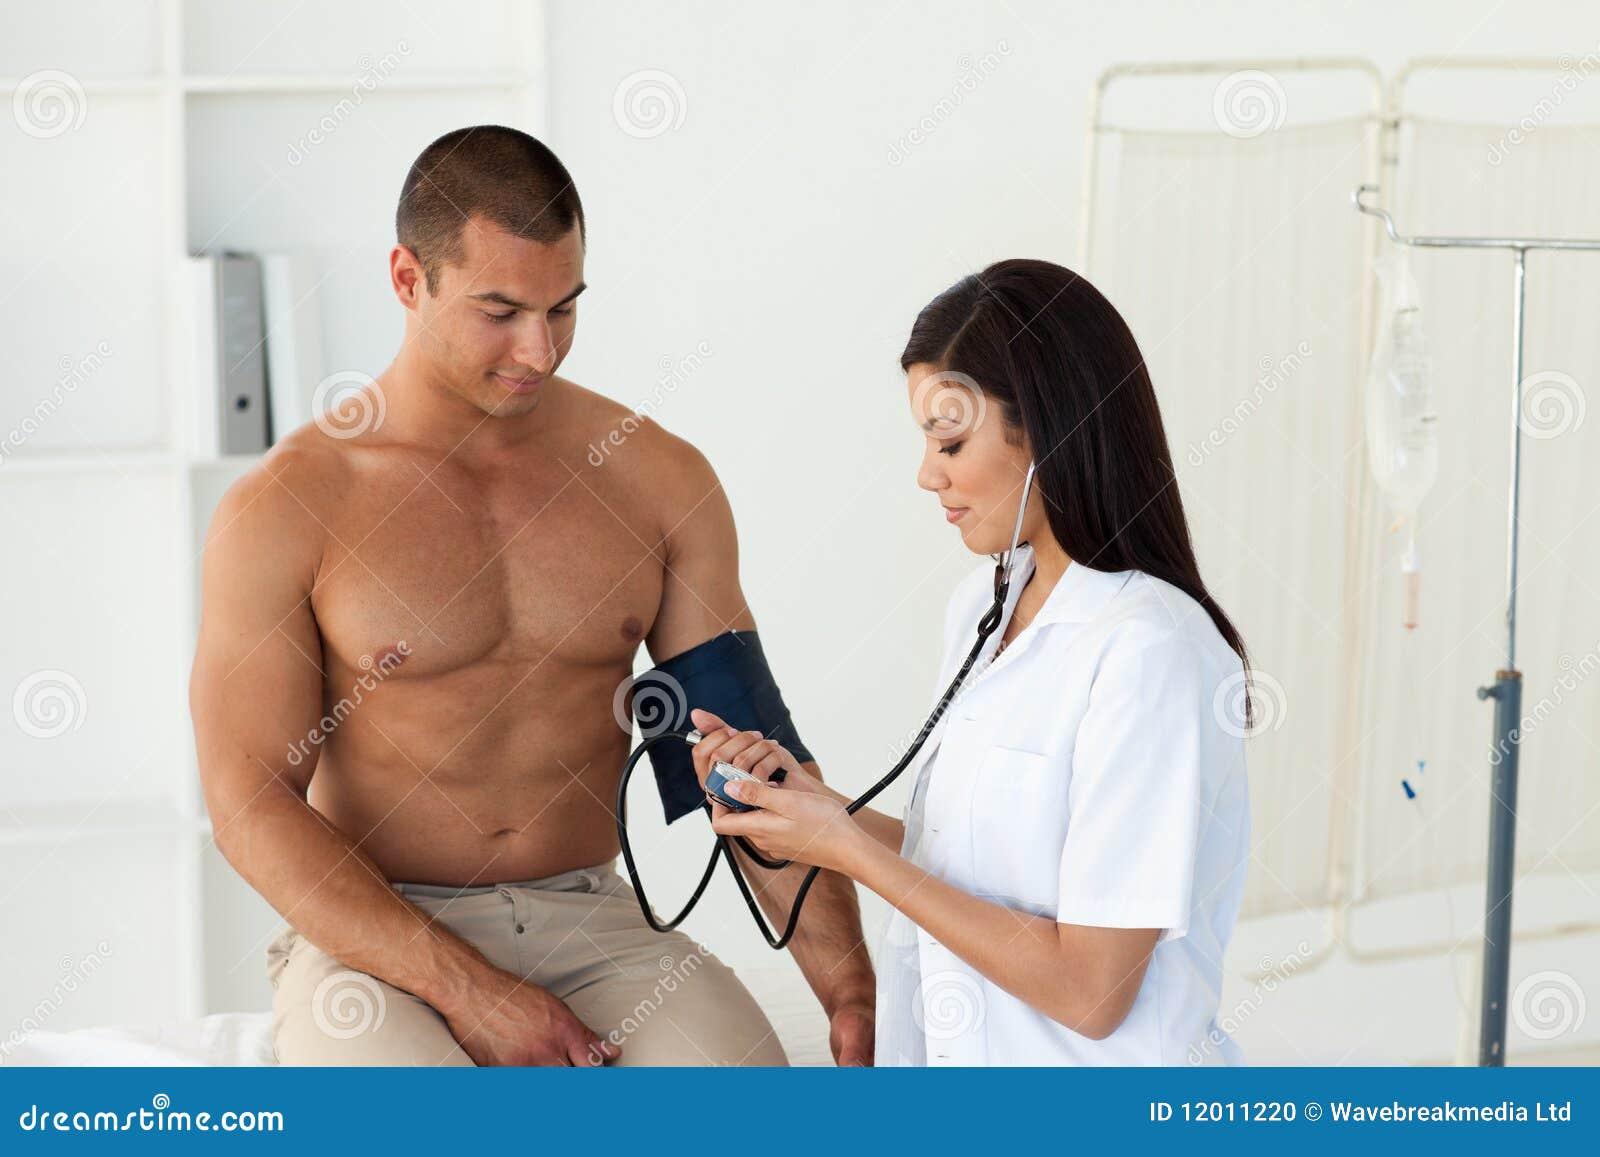 Doctor Checks Blood Pressure